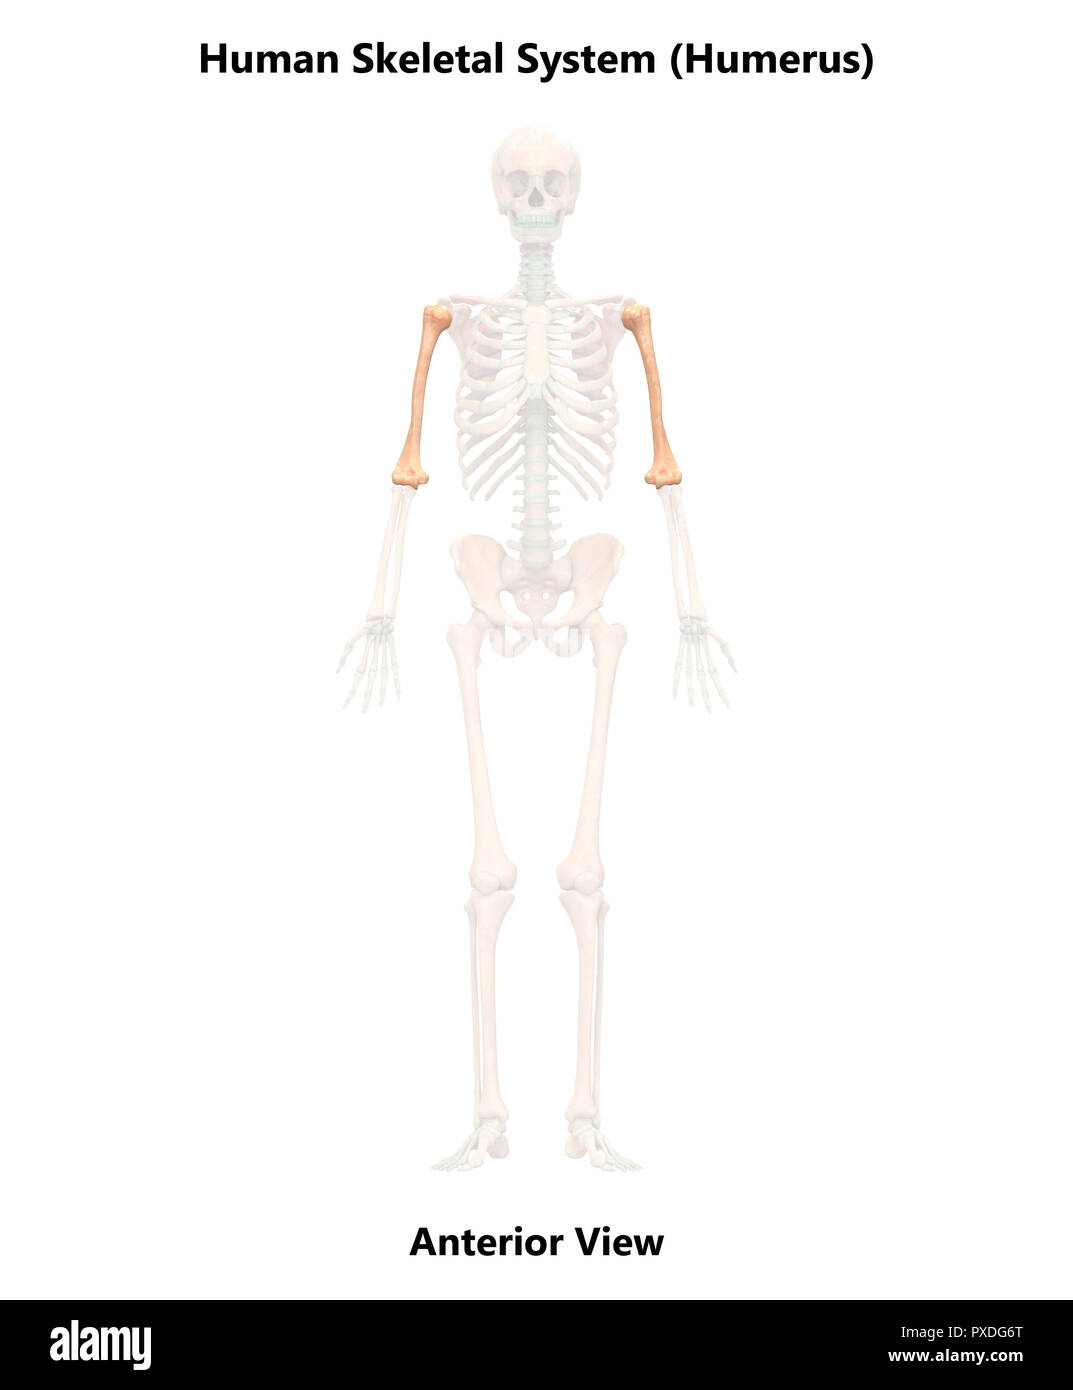 Human Skeleton System Bones Anterior View Anatomy - Stock Image